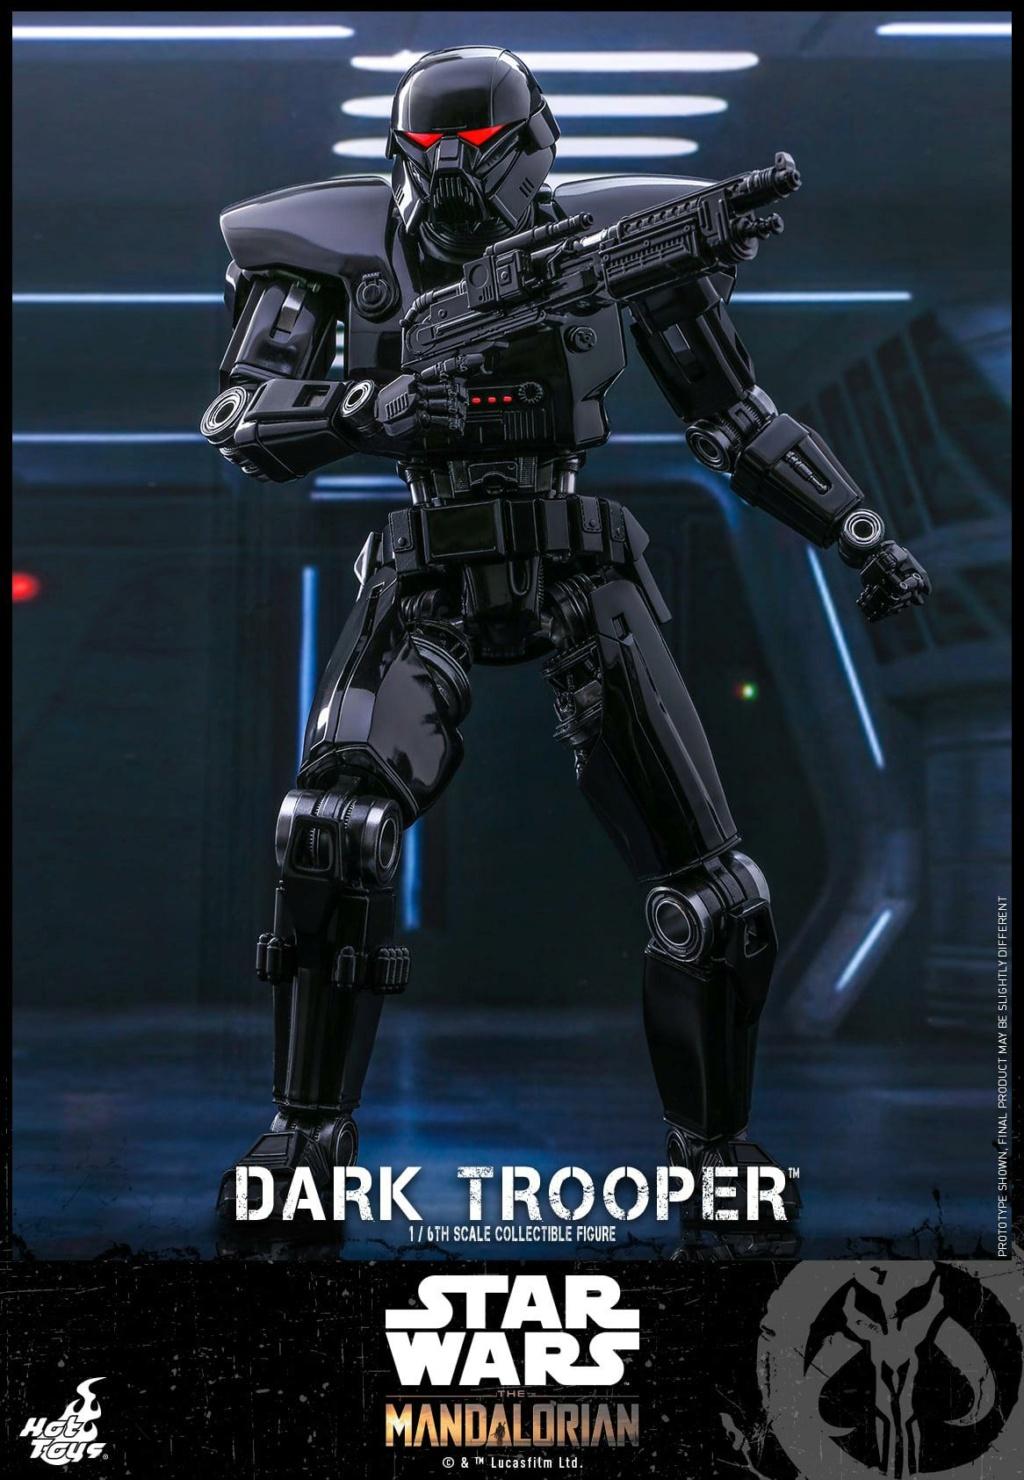 Dark Trooper Collectible Figure - 1/6th scale - Hot Toys Dark_t14